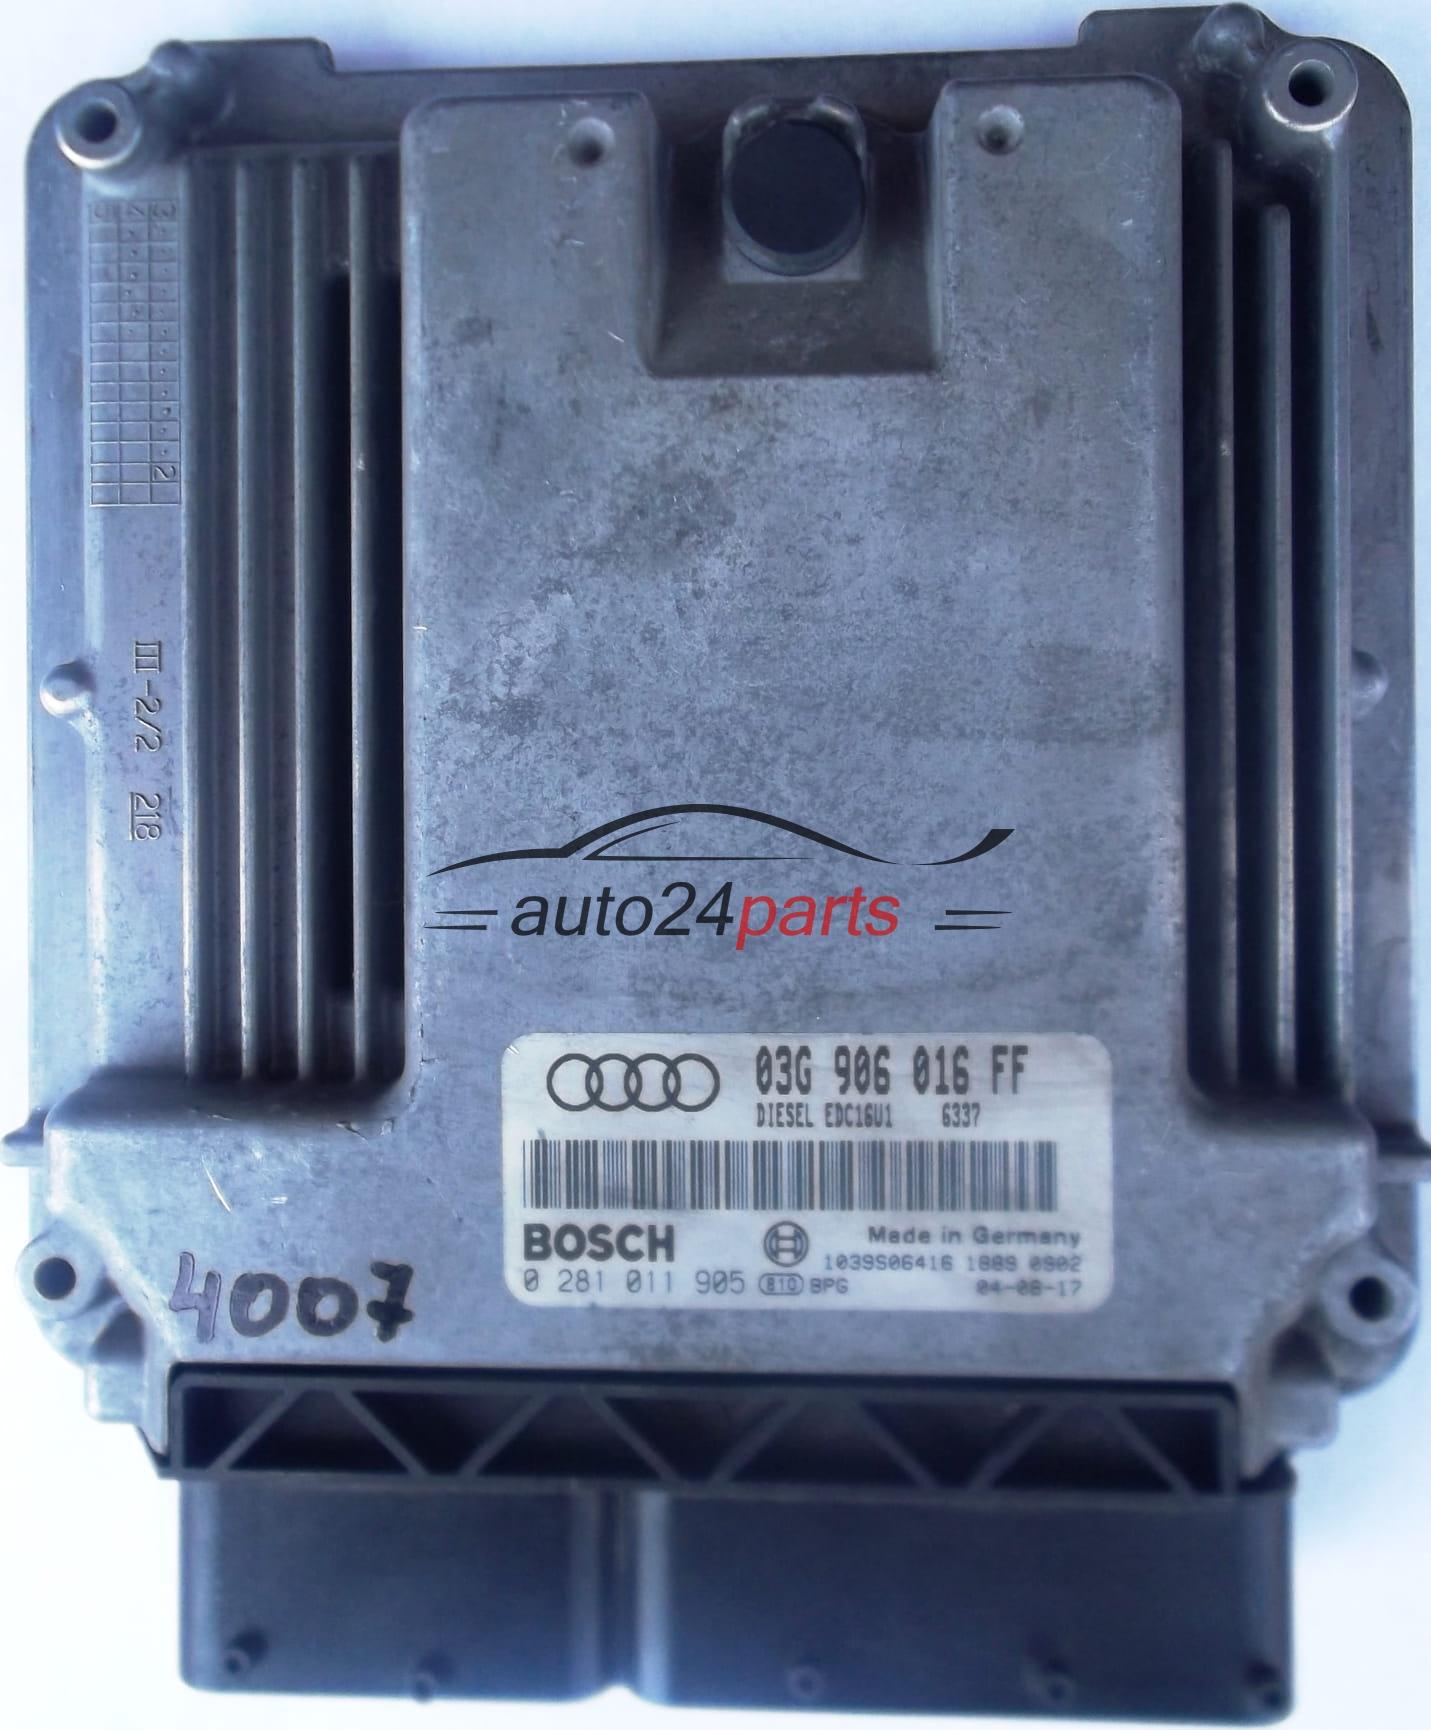 ECU ENGINE CONTROLLER AUDI A3 2 0 TDI 03G 906 016 FF, 03G906016FF, BOSCH 0  281 011 905, 0281011905